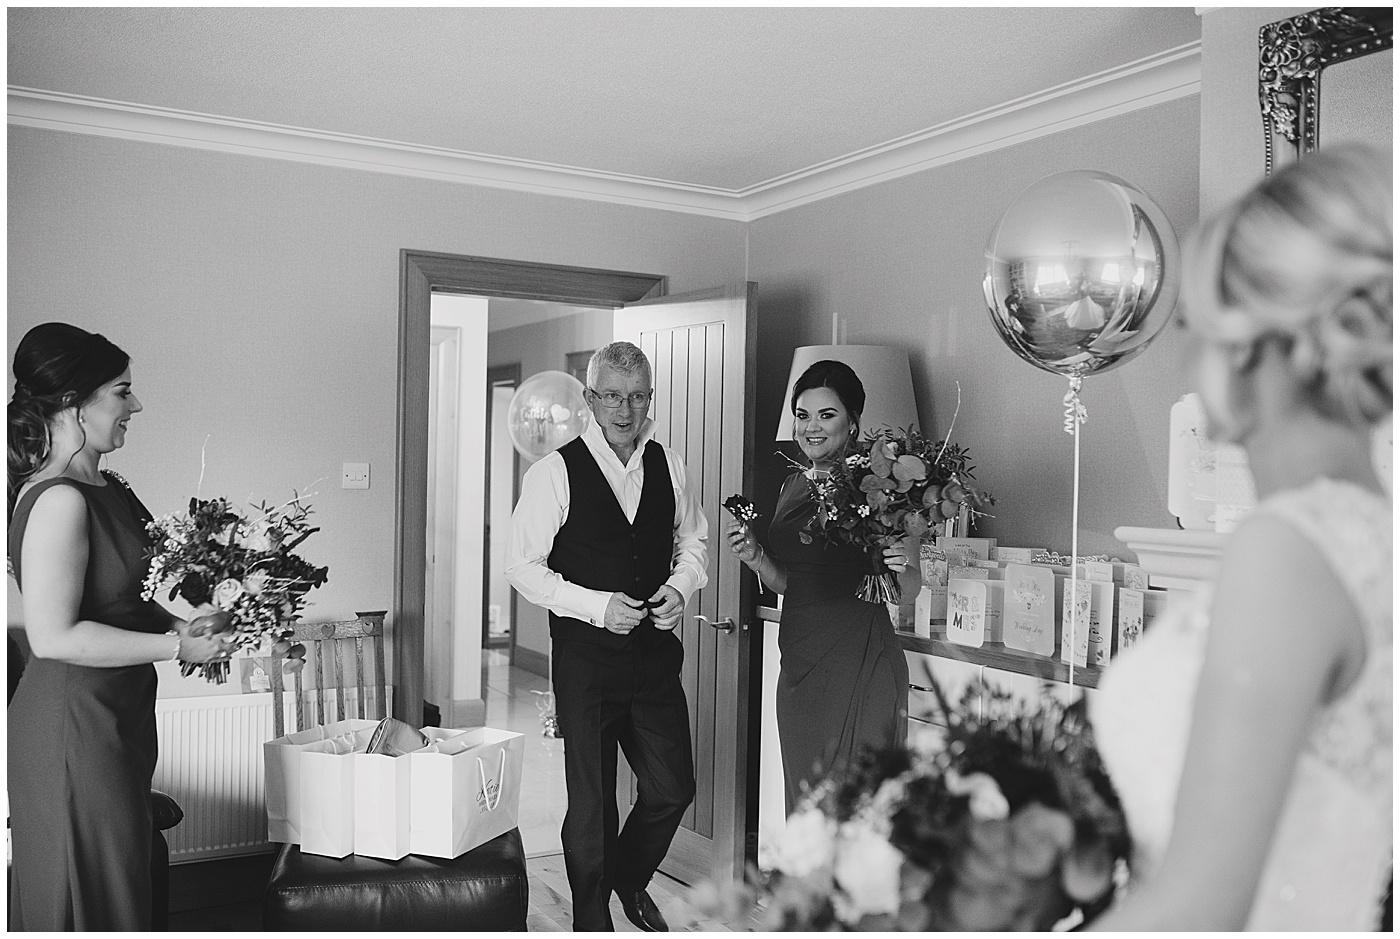 lissan-house-wedding-jude-browne-photography_0018.jpg